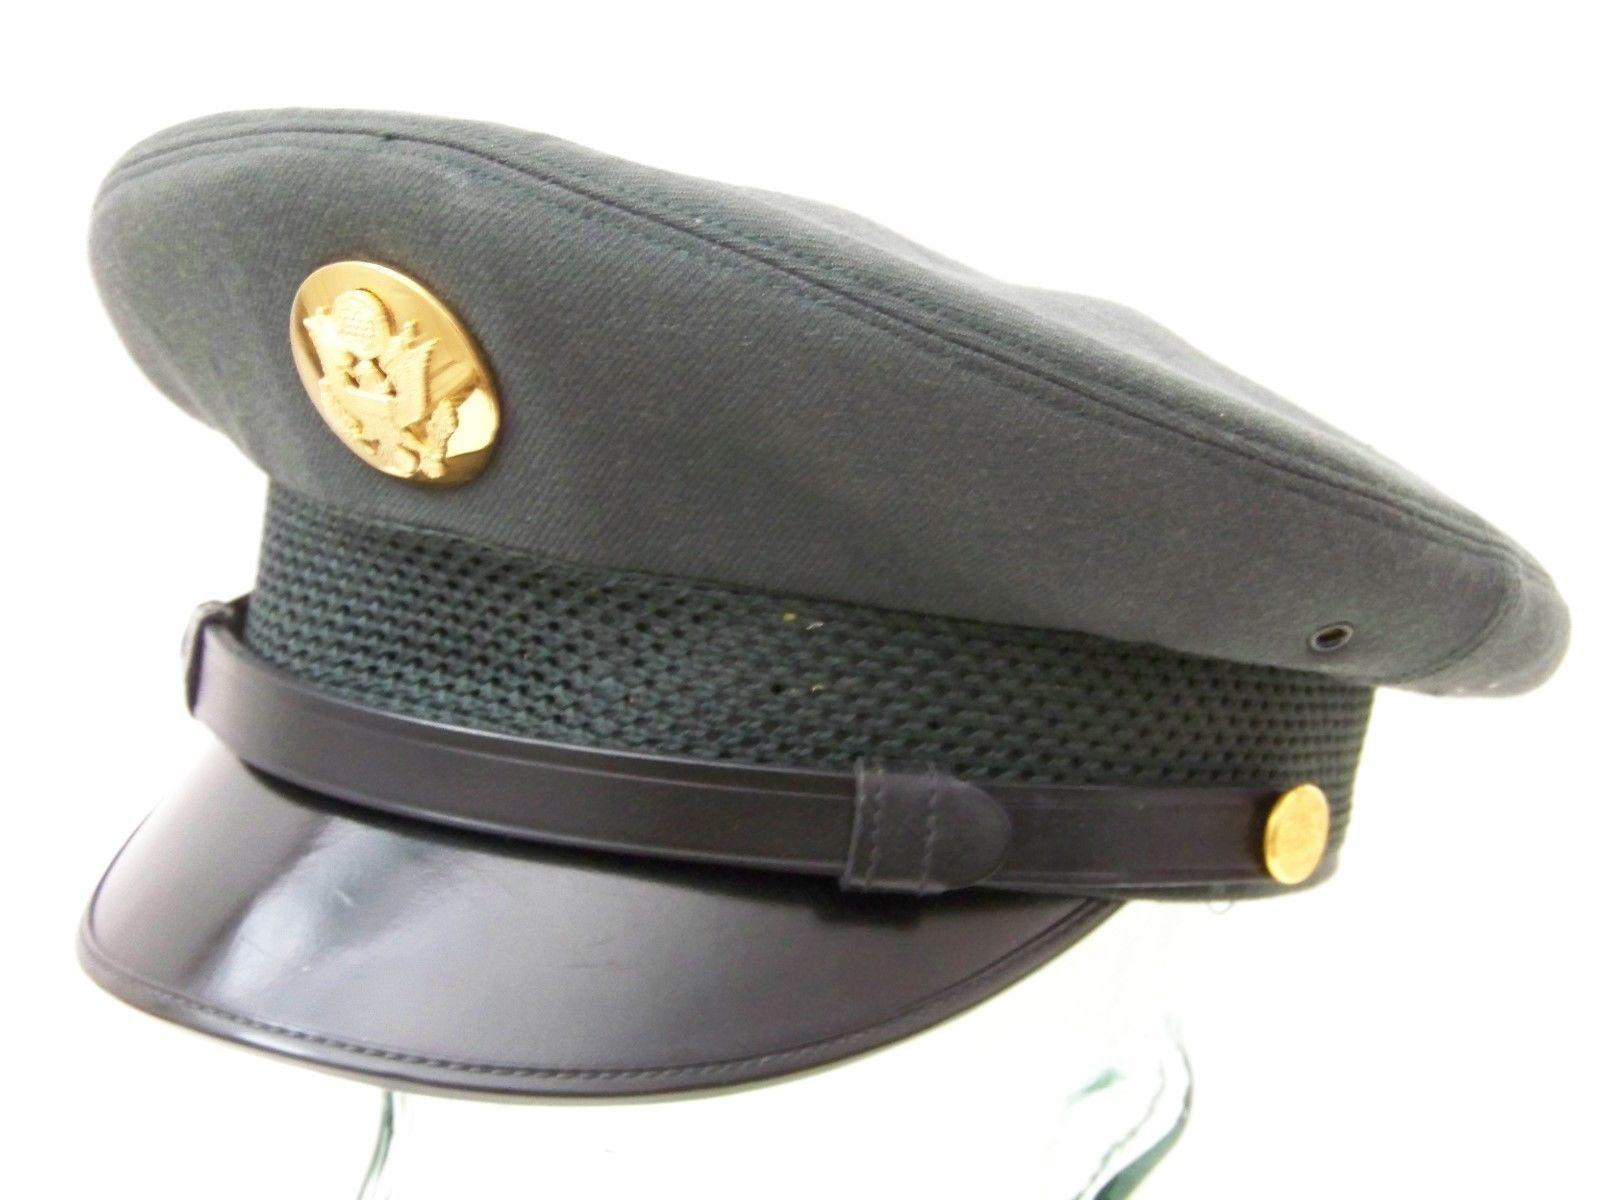 Vintage US Army Military Vietnam Era Wool Army Green AG 44 Service ...